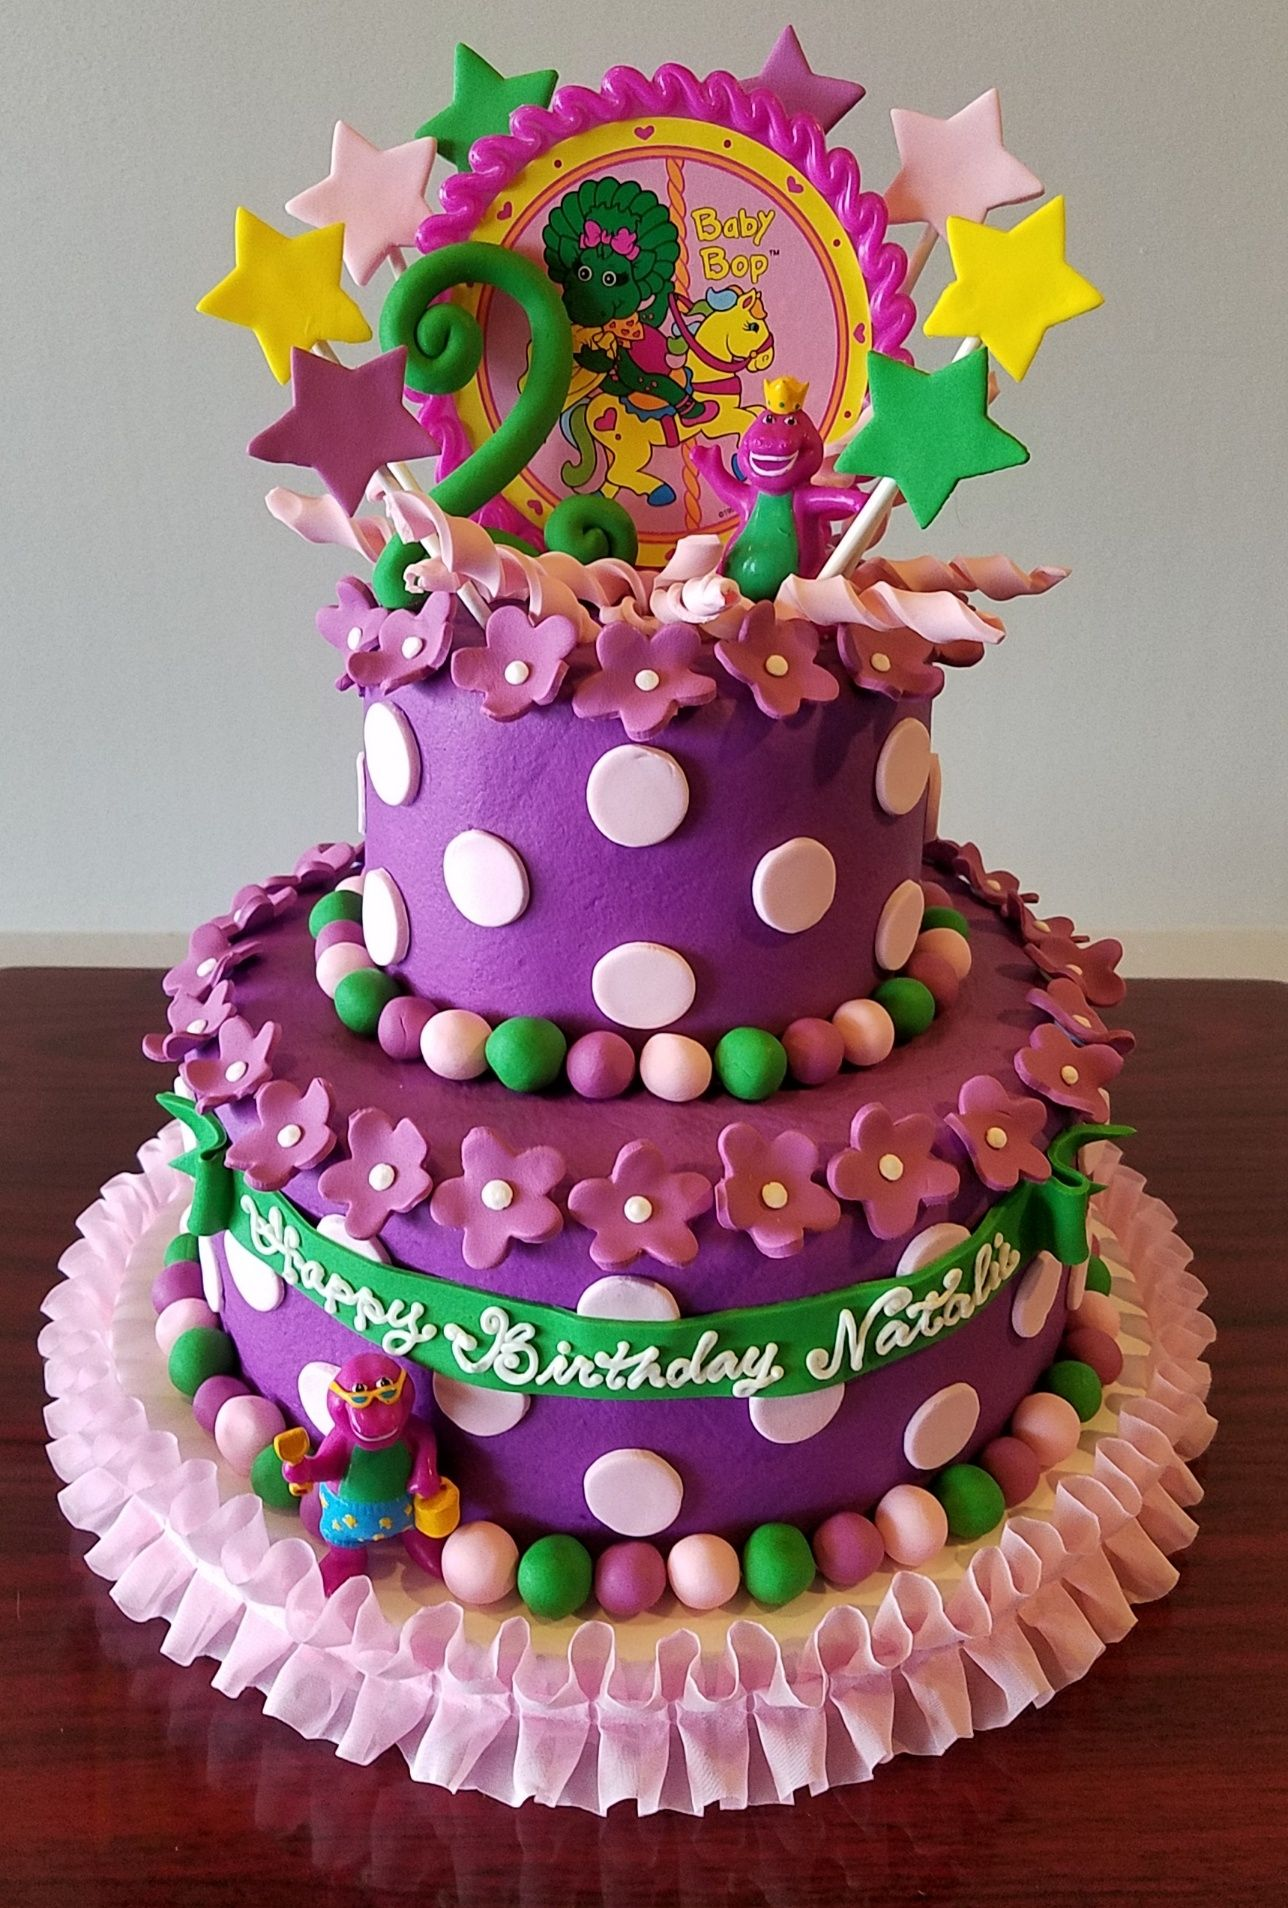 Barney Baby Bop Tiered Birthday Cake Adrienne Co Bakery